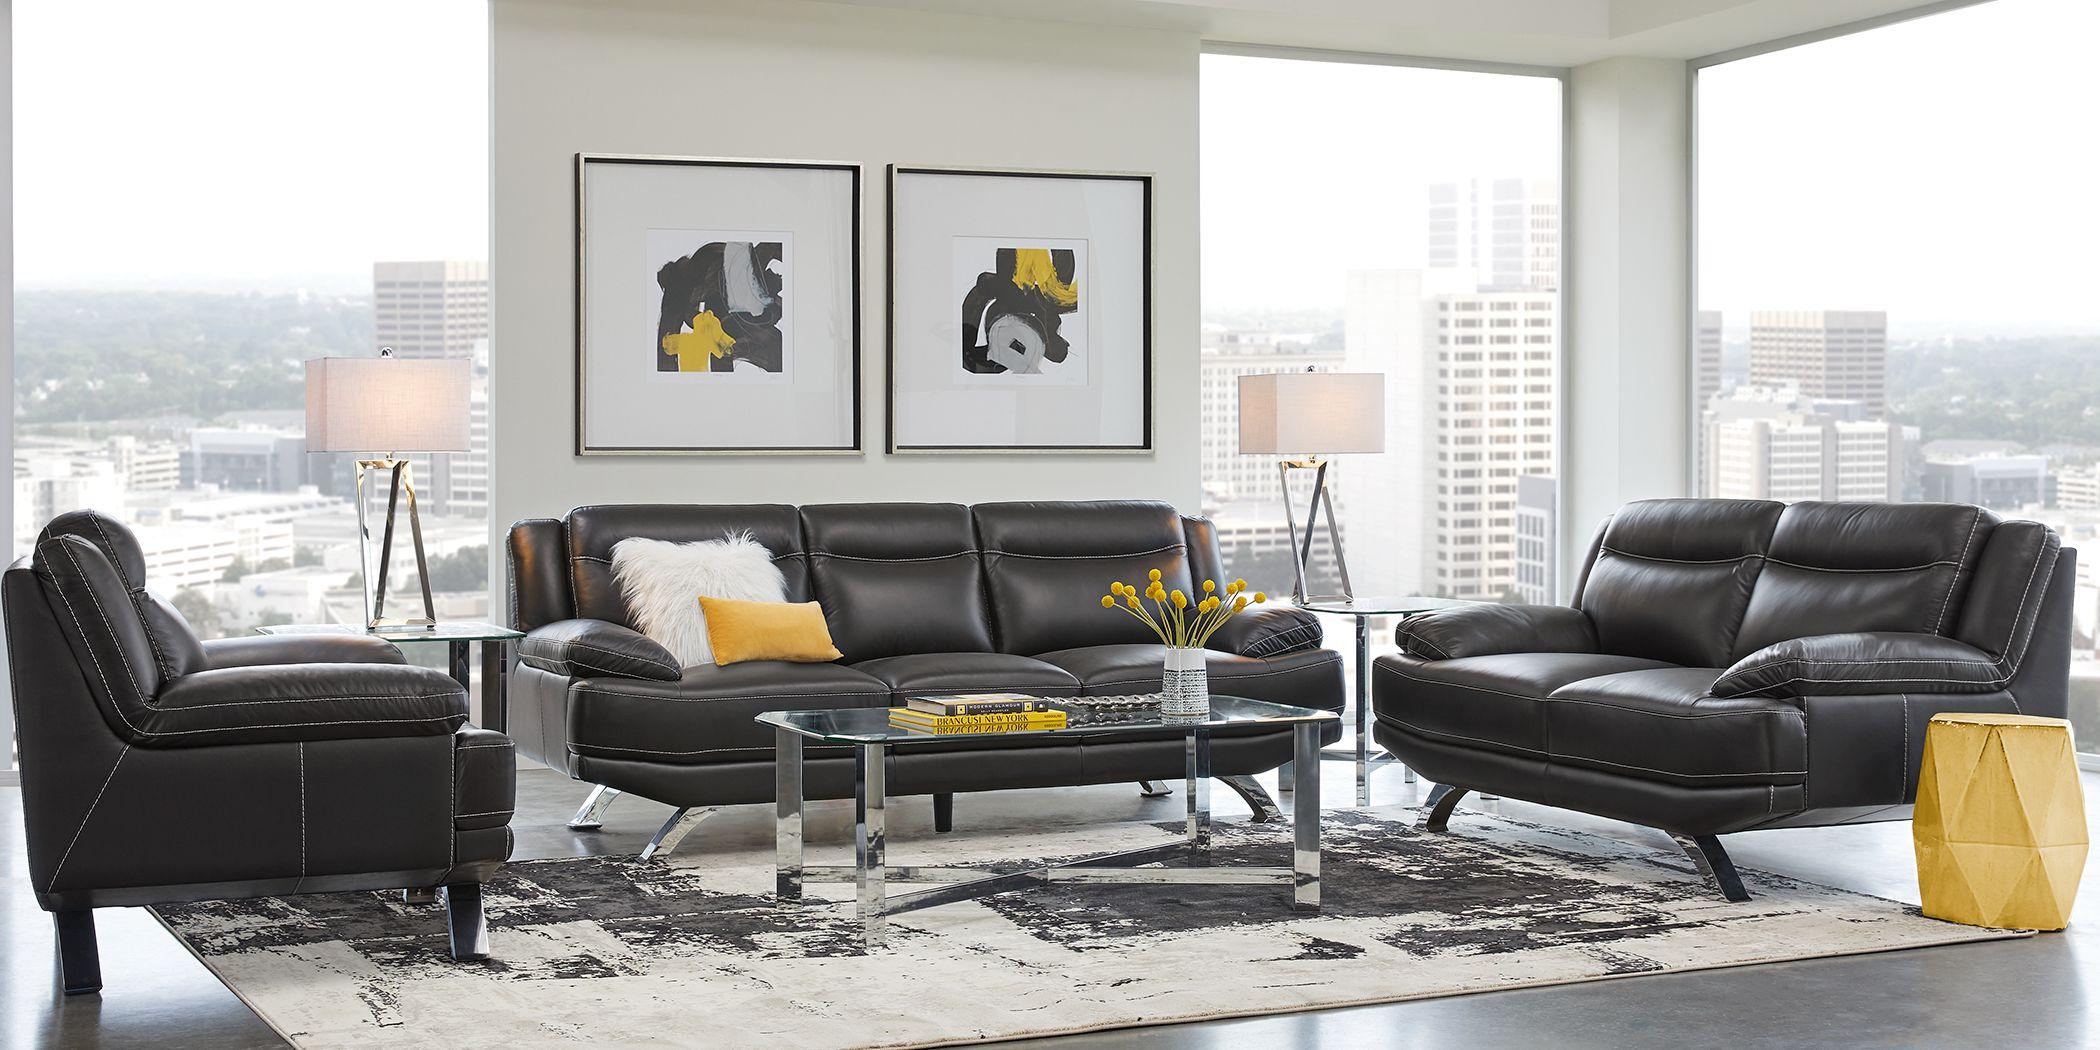 Sofia Vergara Zamora Black Leather 3 Pc Living Room